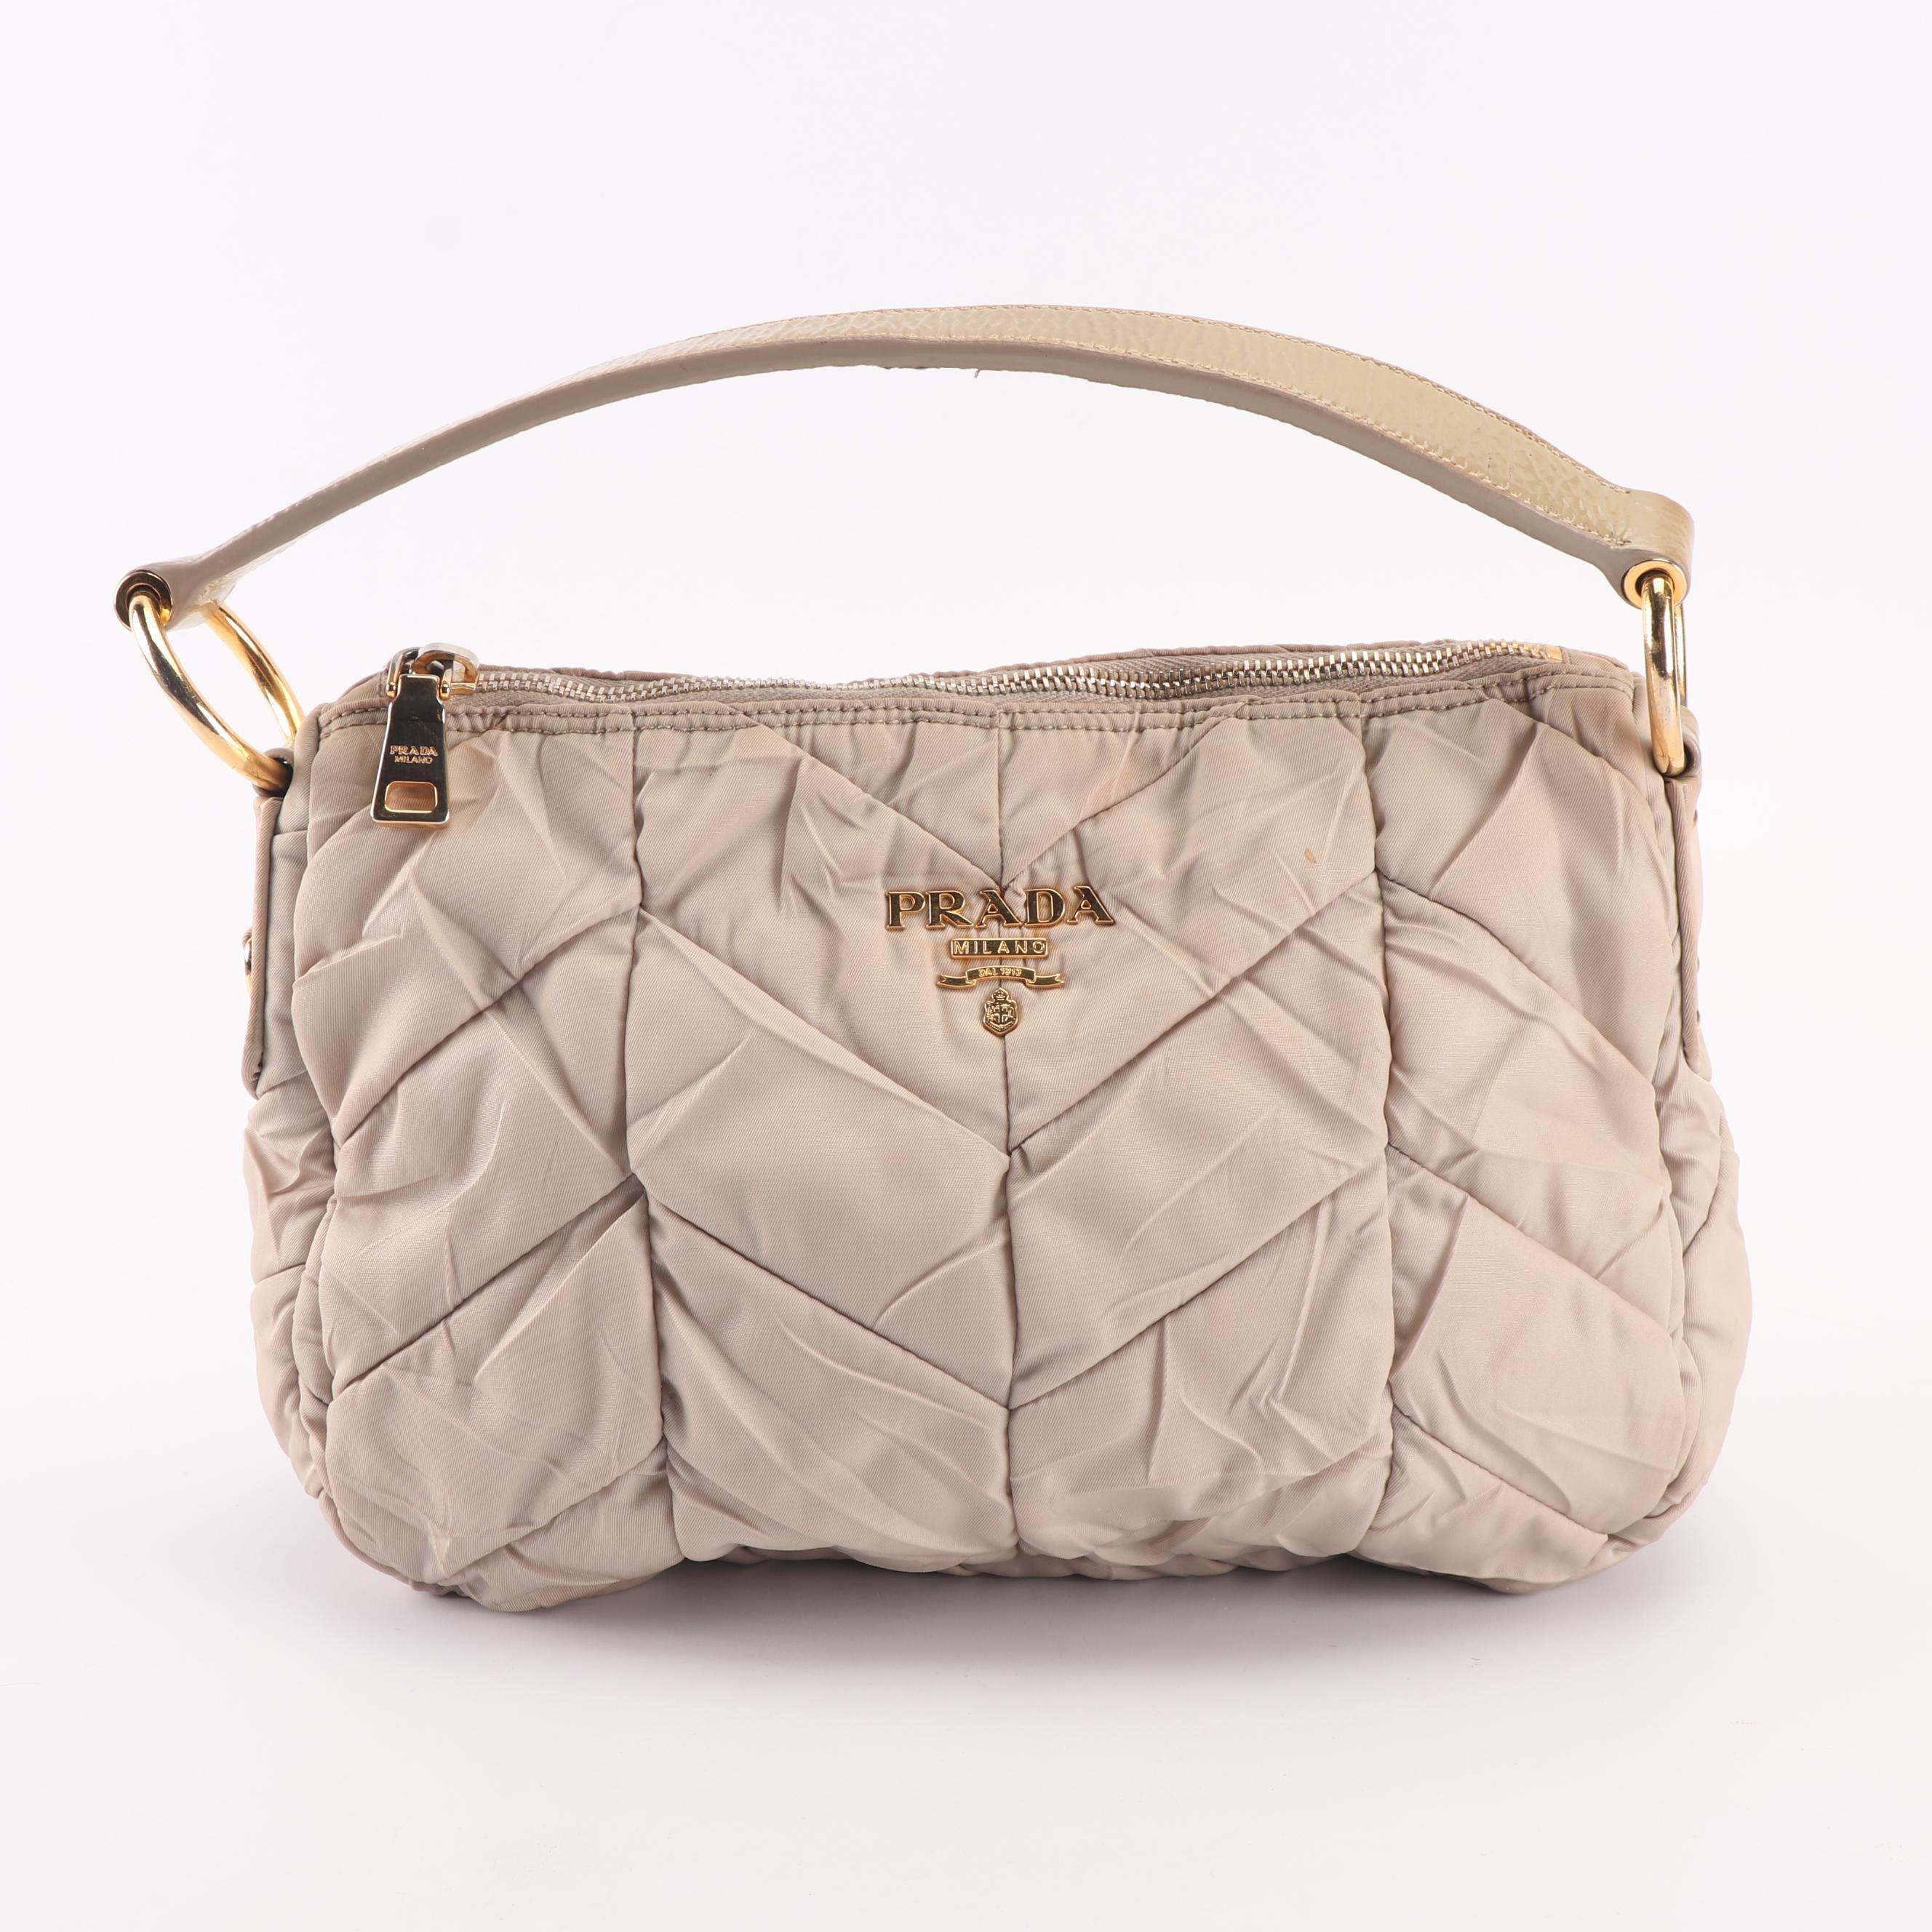 Prada Tessuta Chevron Quilted Tan Nylon Small Hobo Handbag